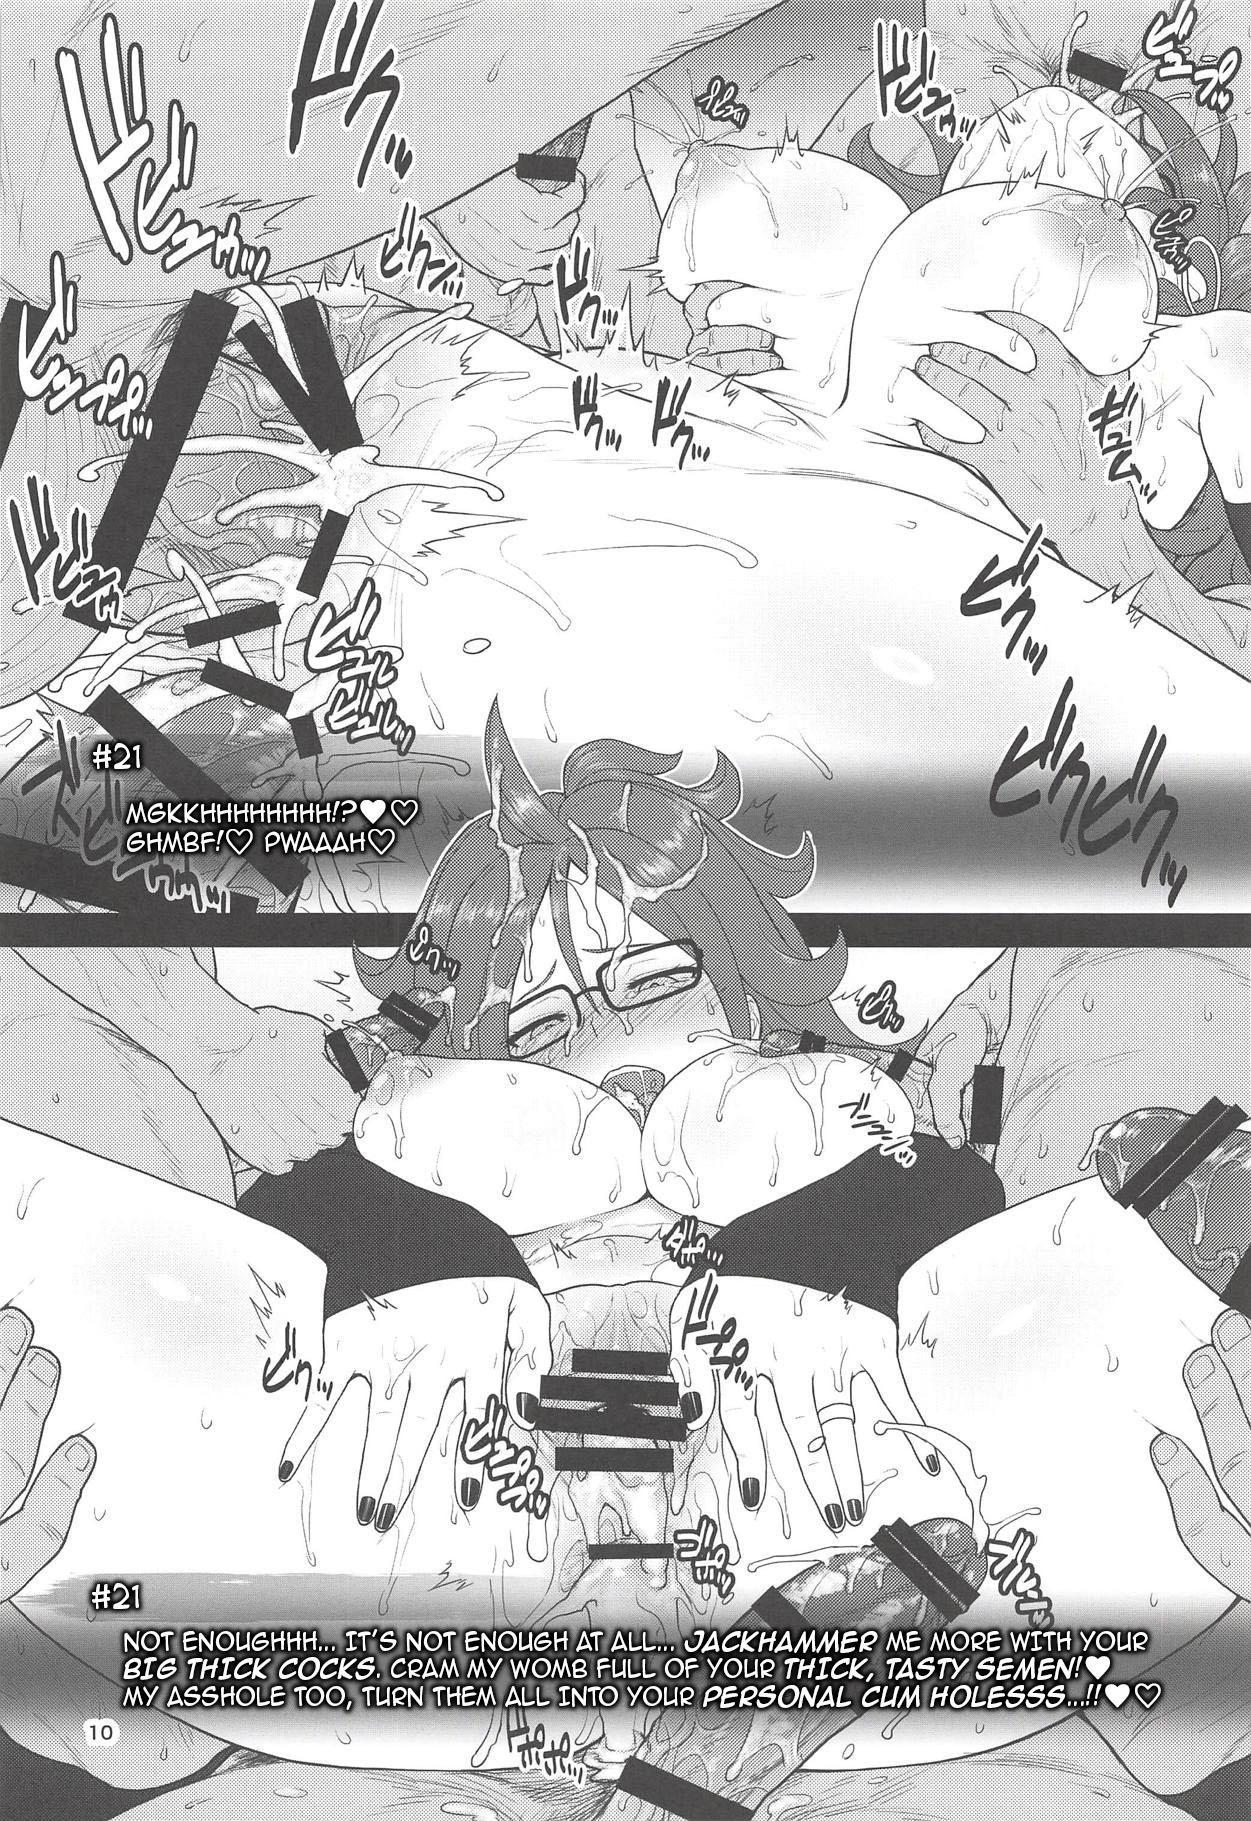 (C94) [Shinnihon Pepsitou (St.germain-sal)] 1-tsubu de 2-do Oishii | 2 for 1 Delicious Fun (Dragon Ball FighterZ) [English] {darknight} 8